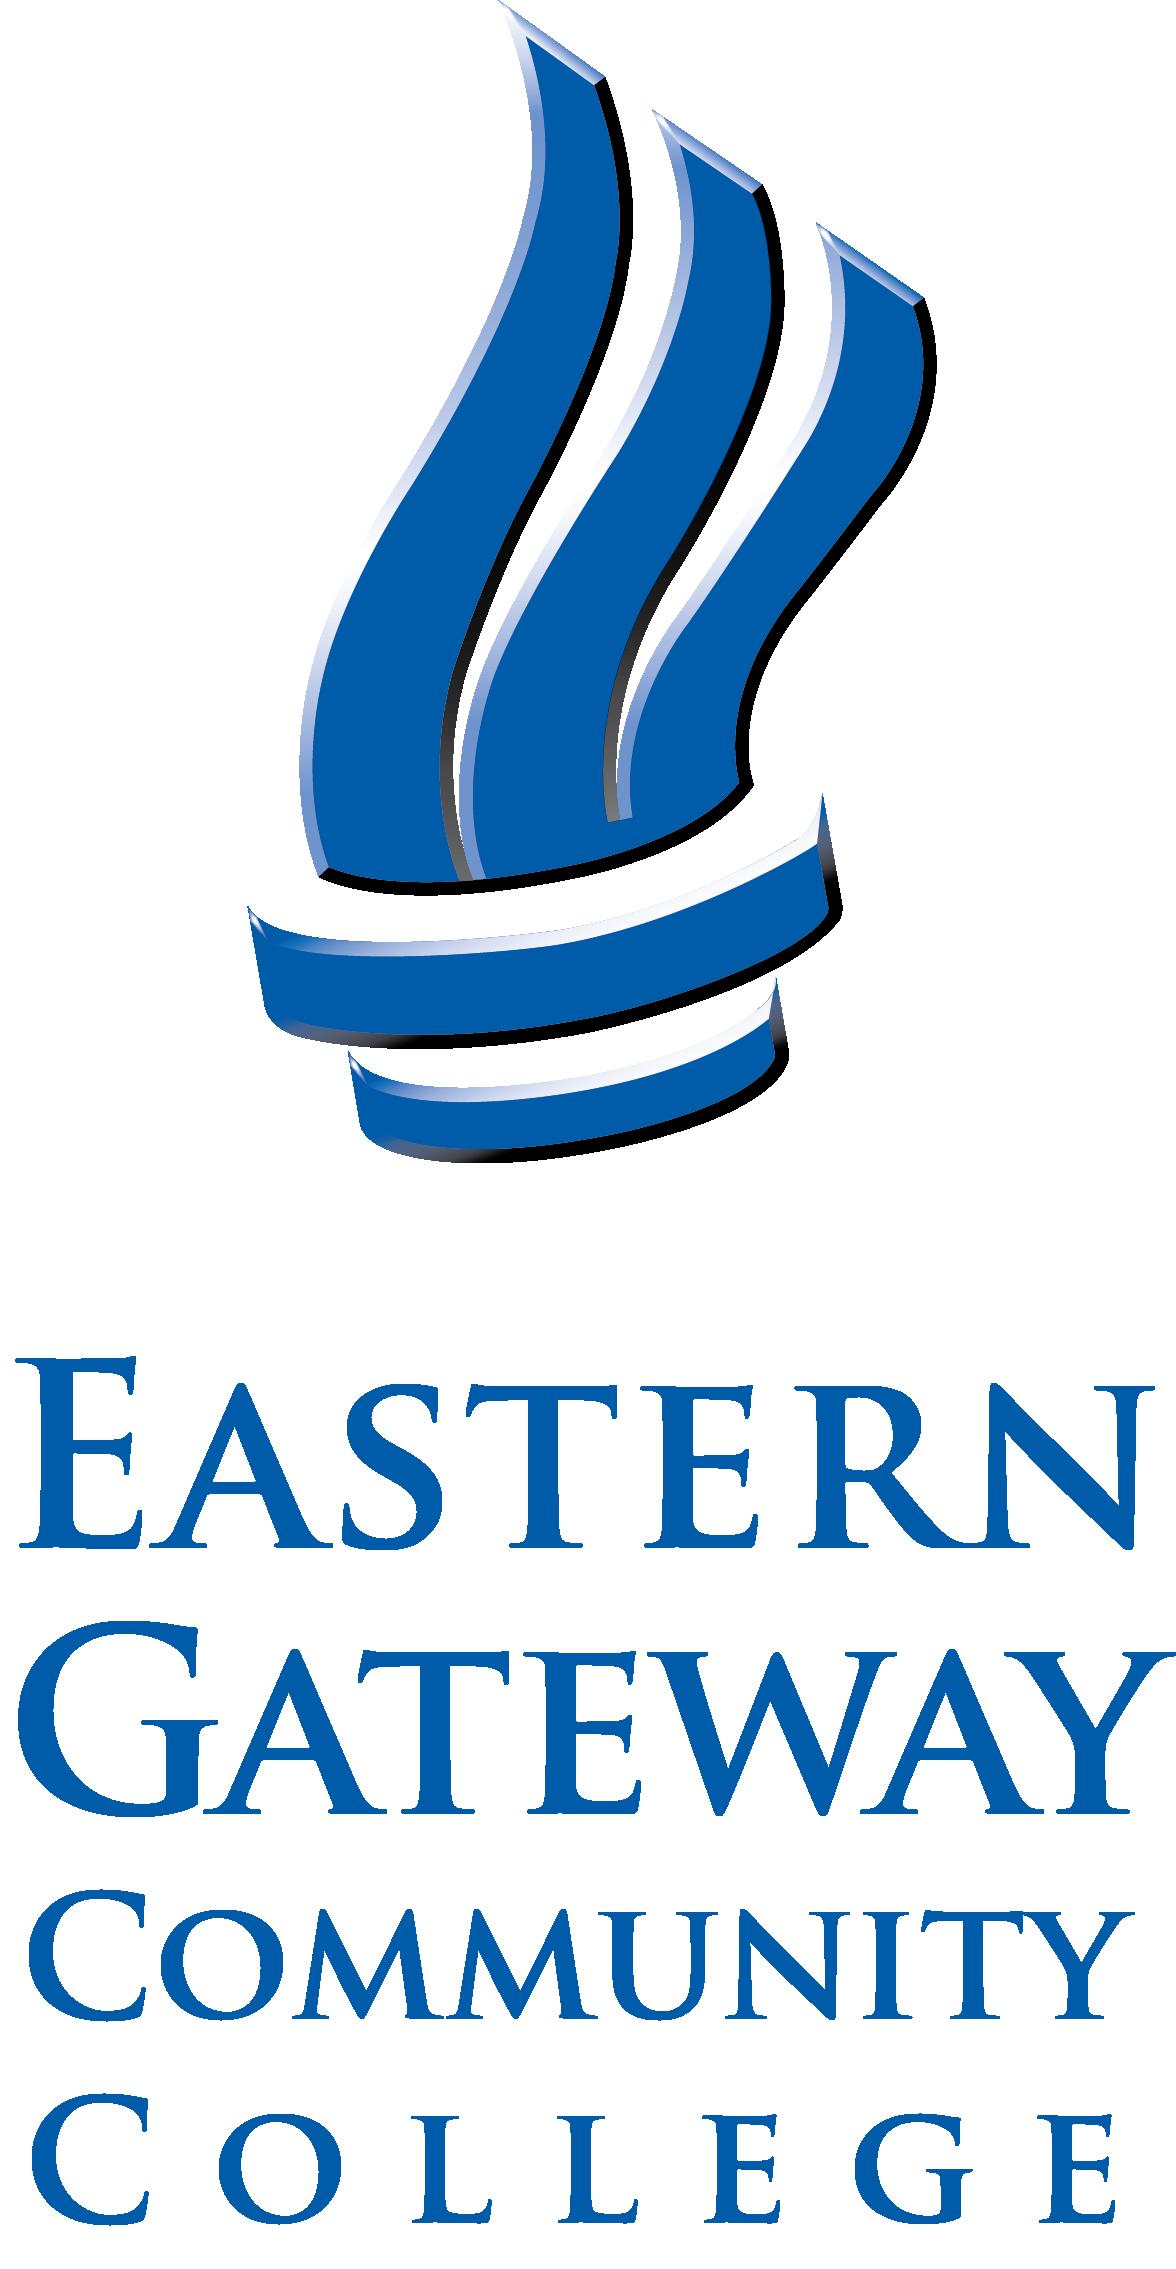 Gate clipart gateway. Eastern community college wikipedia